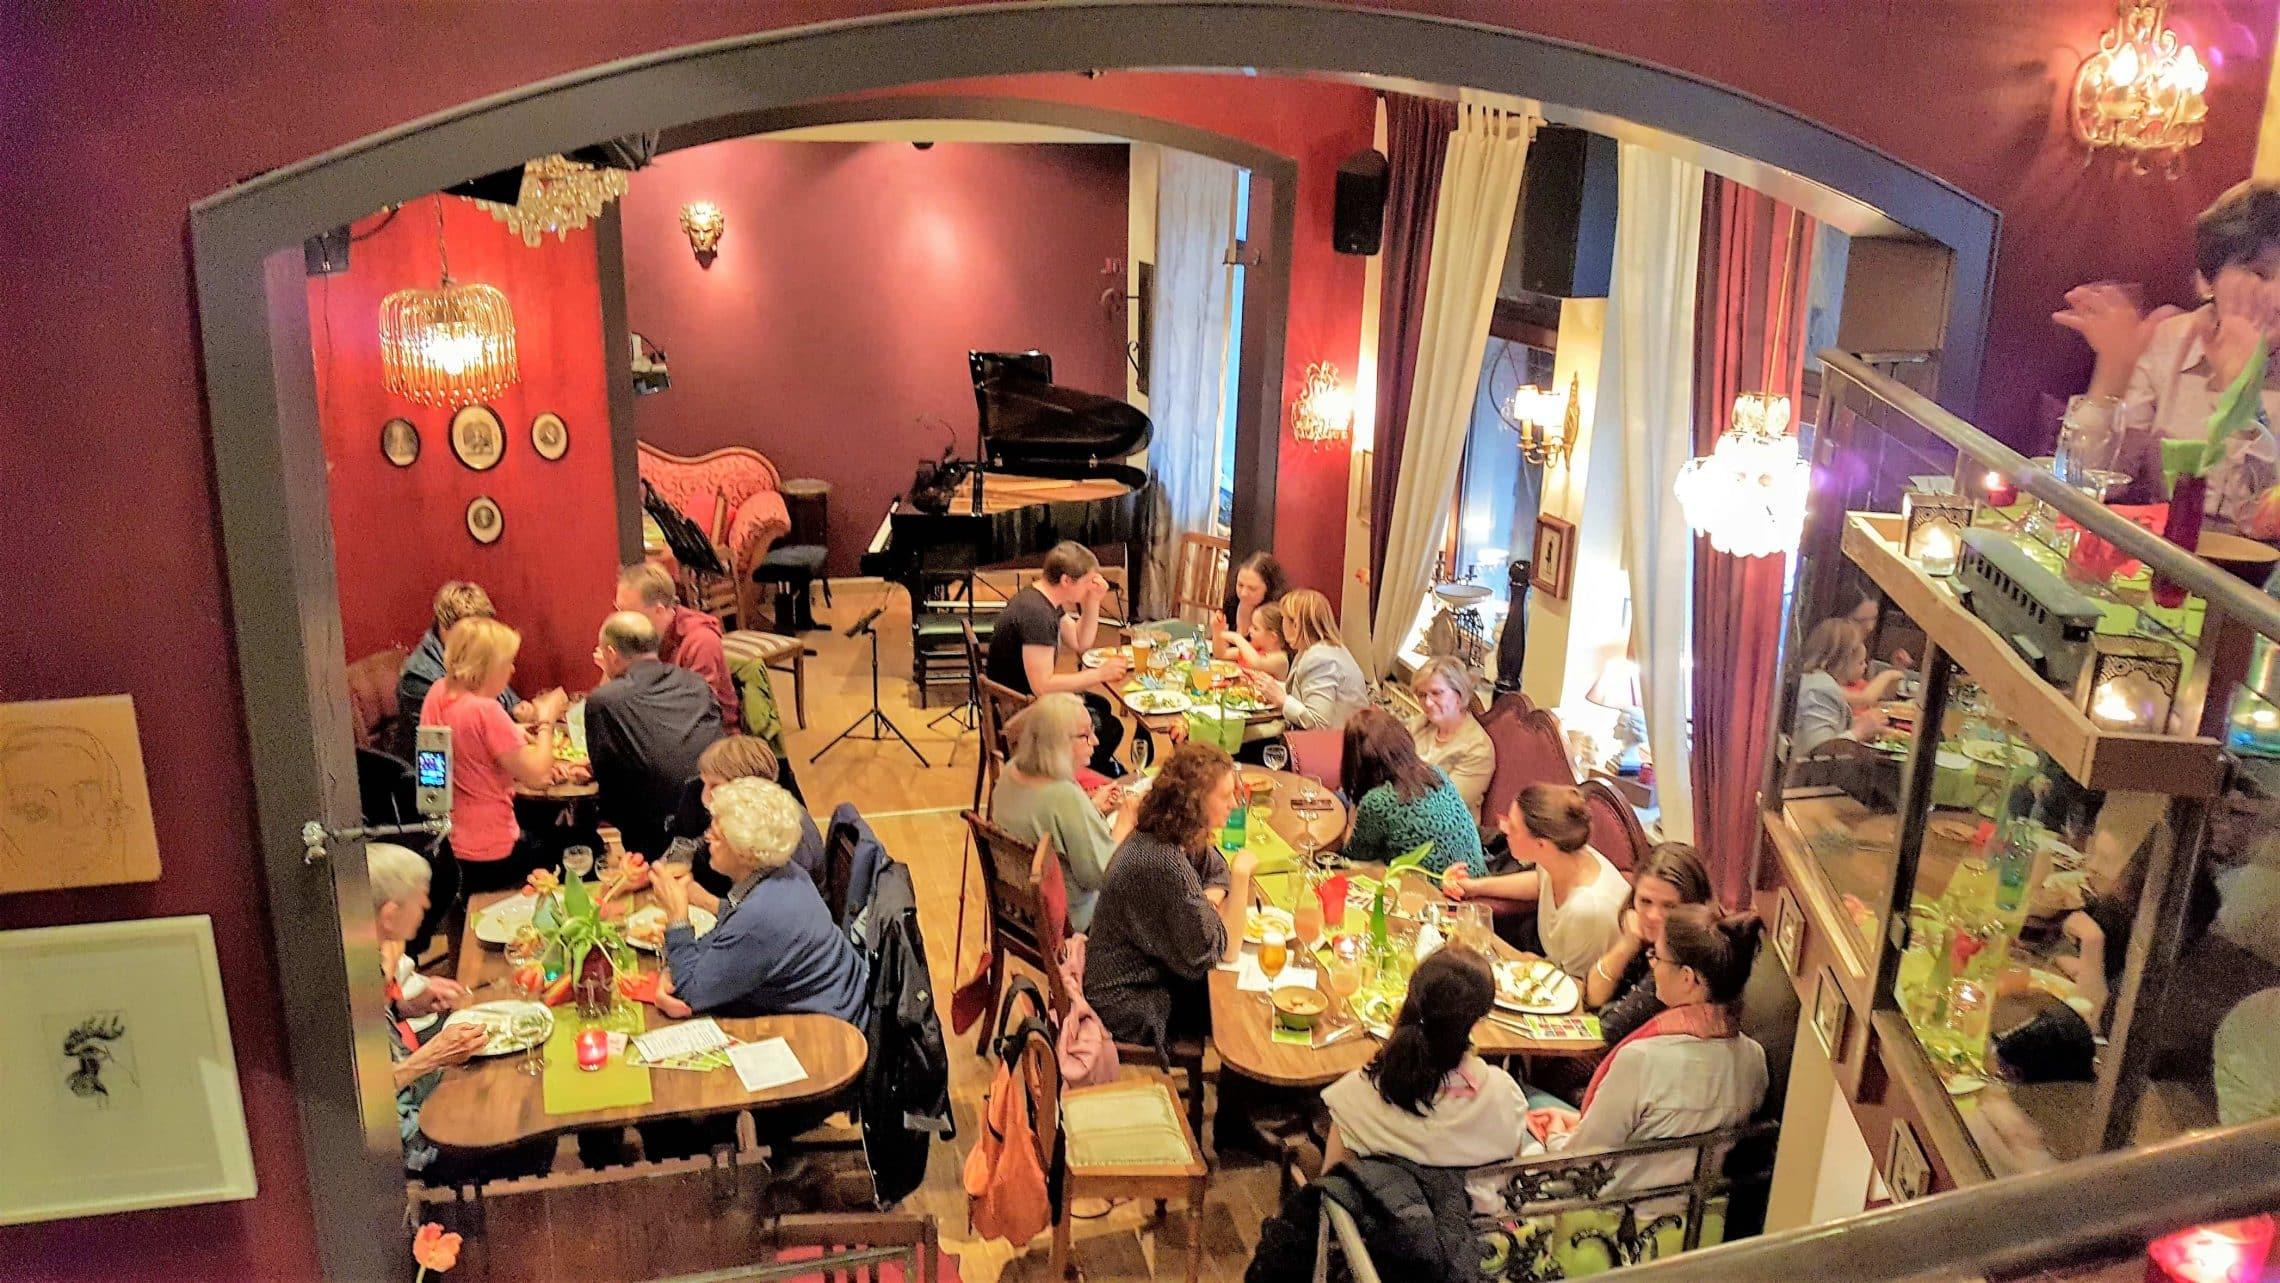 Style Hannover Kanapee B 1 1 - Das Kanapee steht für Kultur pur